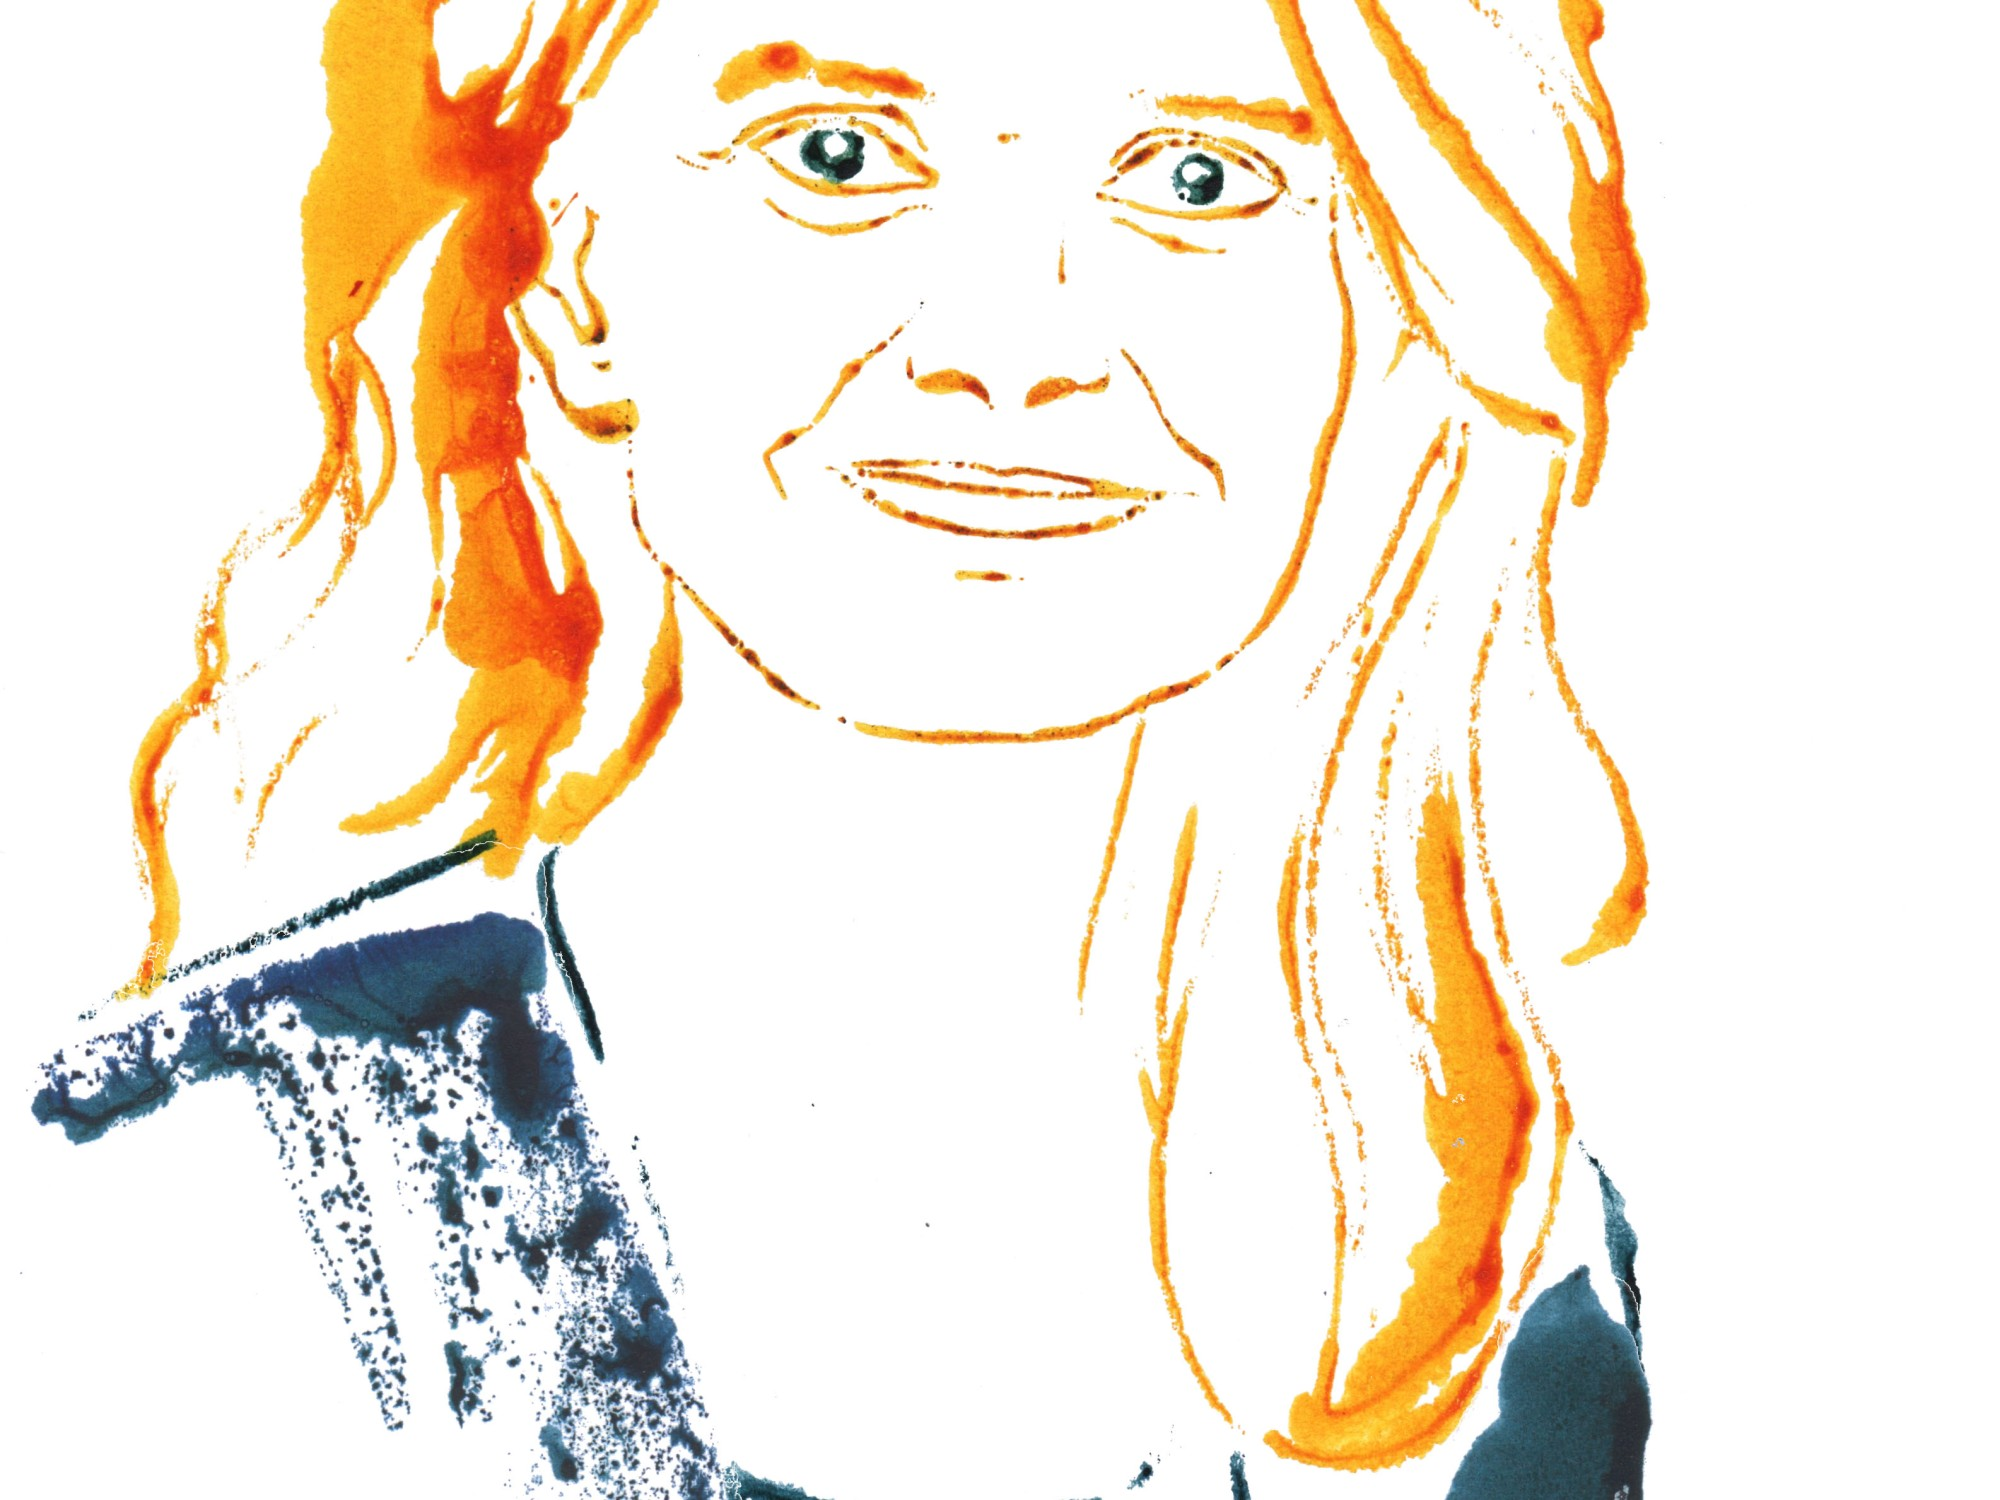 portrait brigitte woman magazine monoprint illustration blotted line